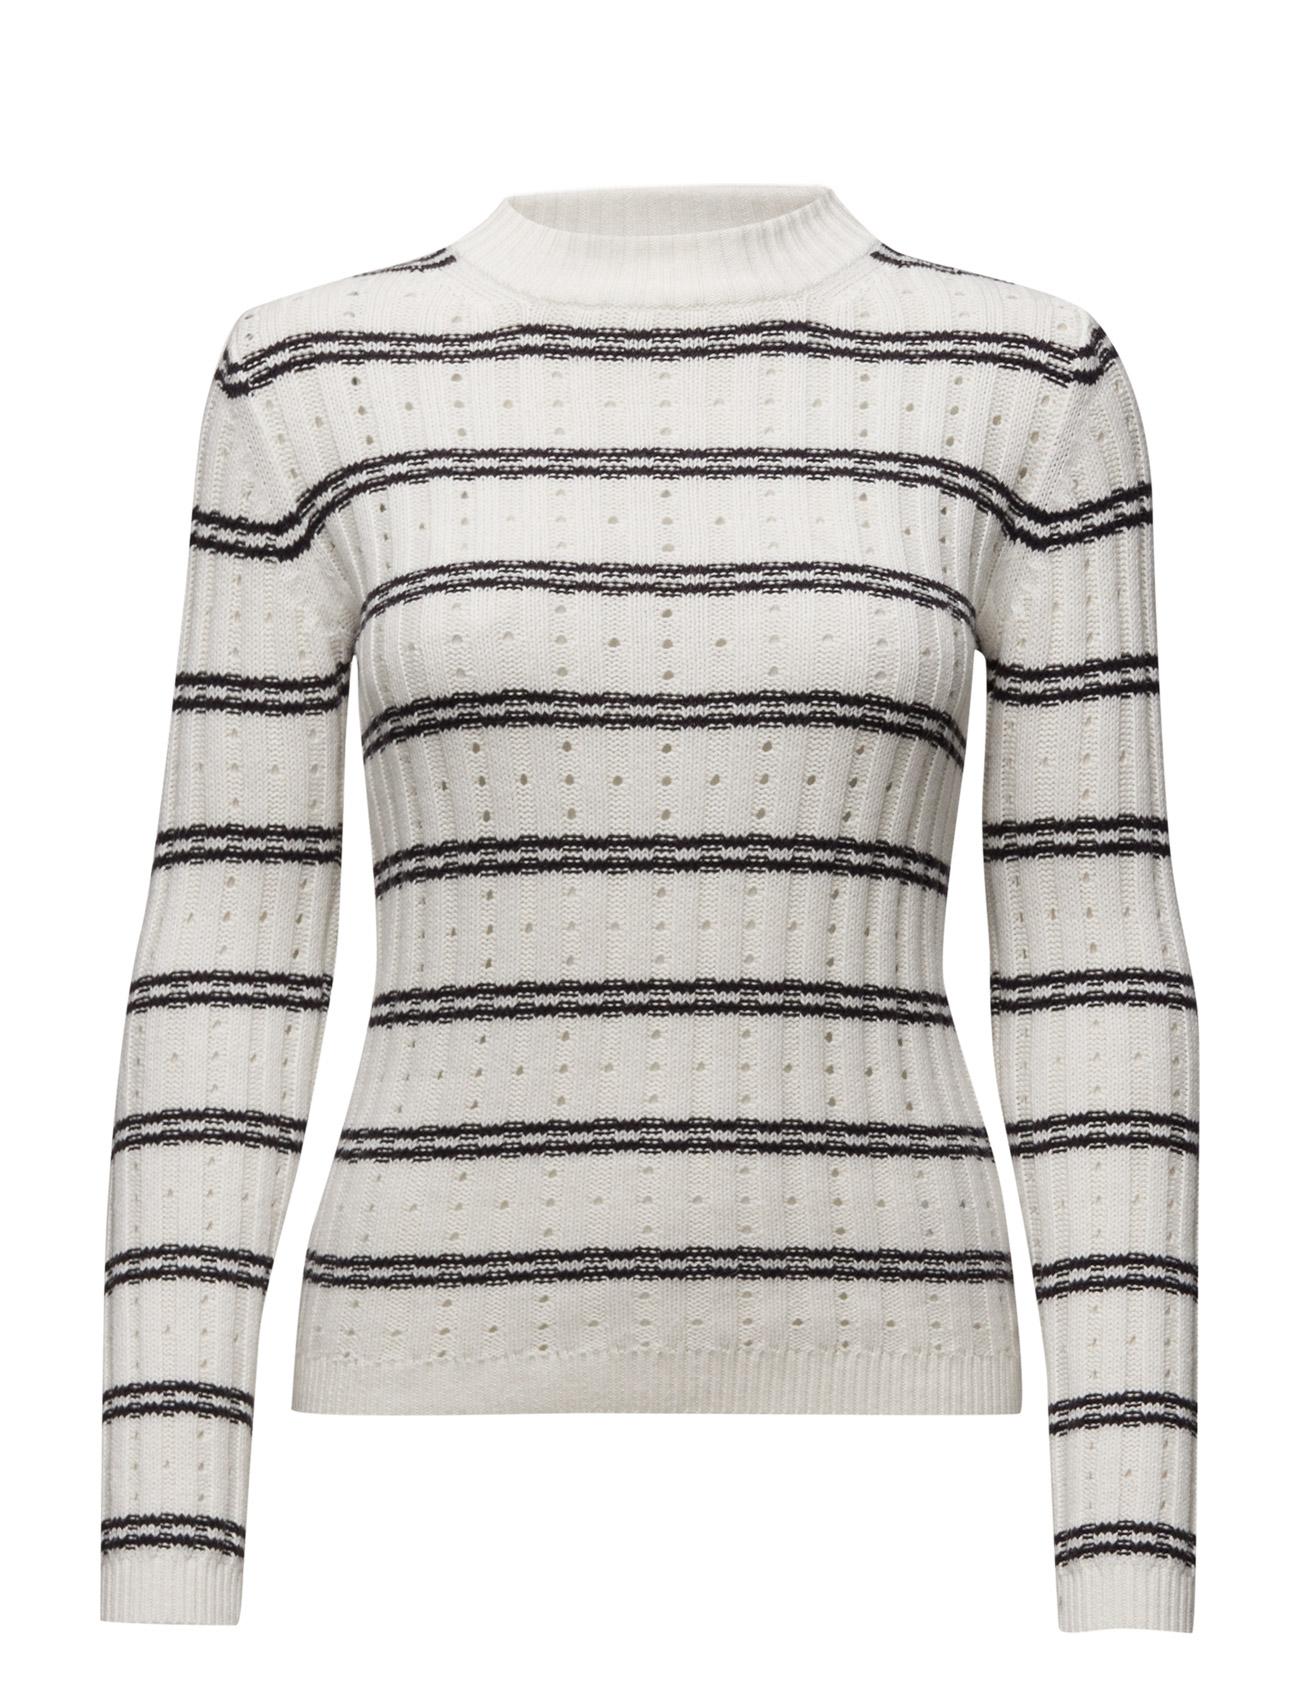 Po Rib Knits Ls High Neck Jmpr French Connection Sweatshirts til Damer i